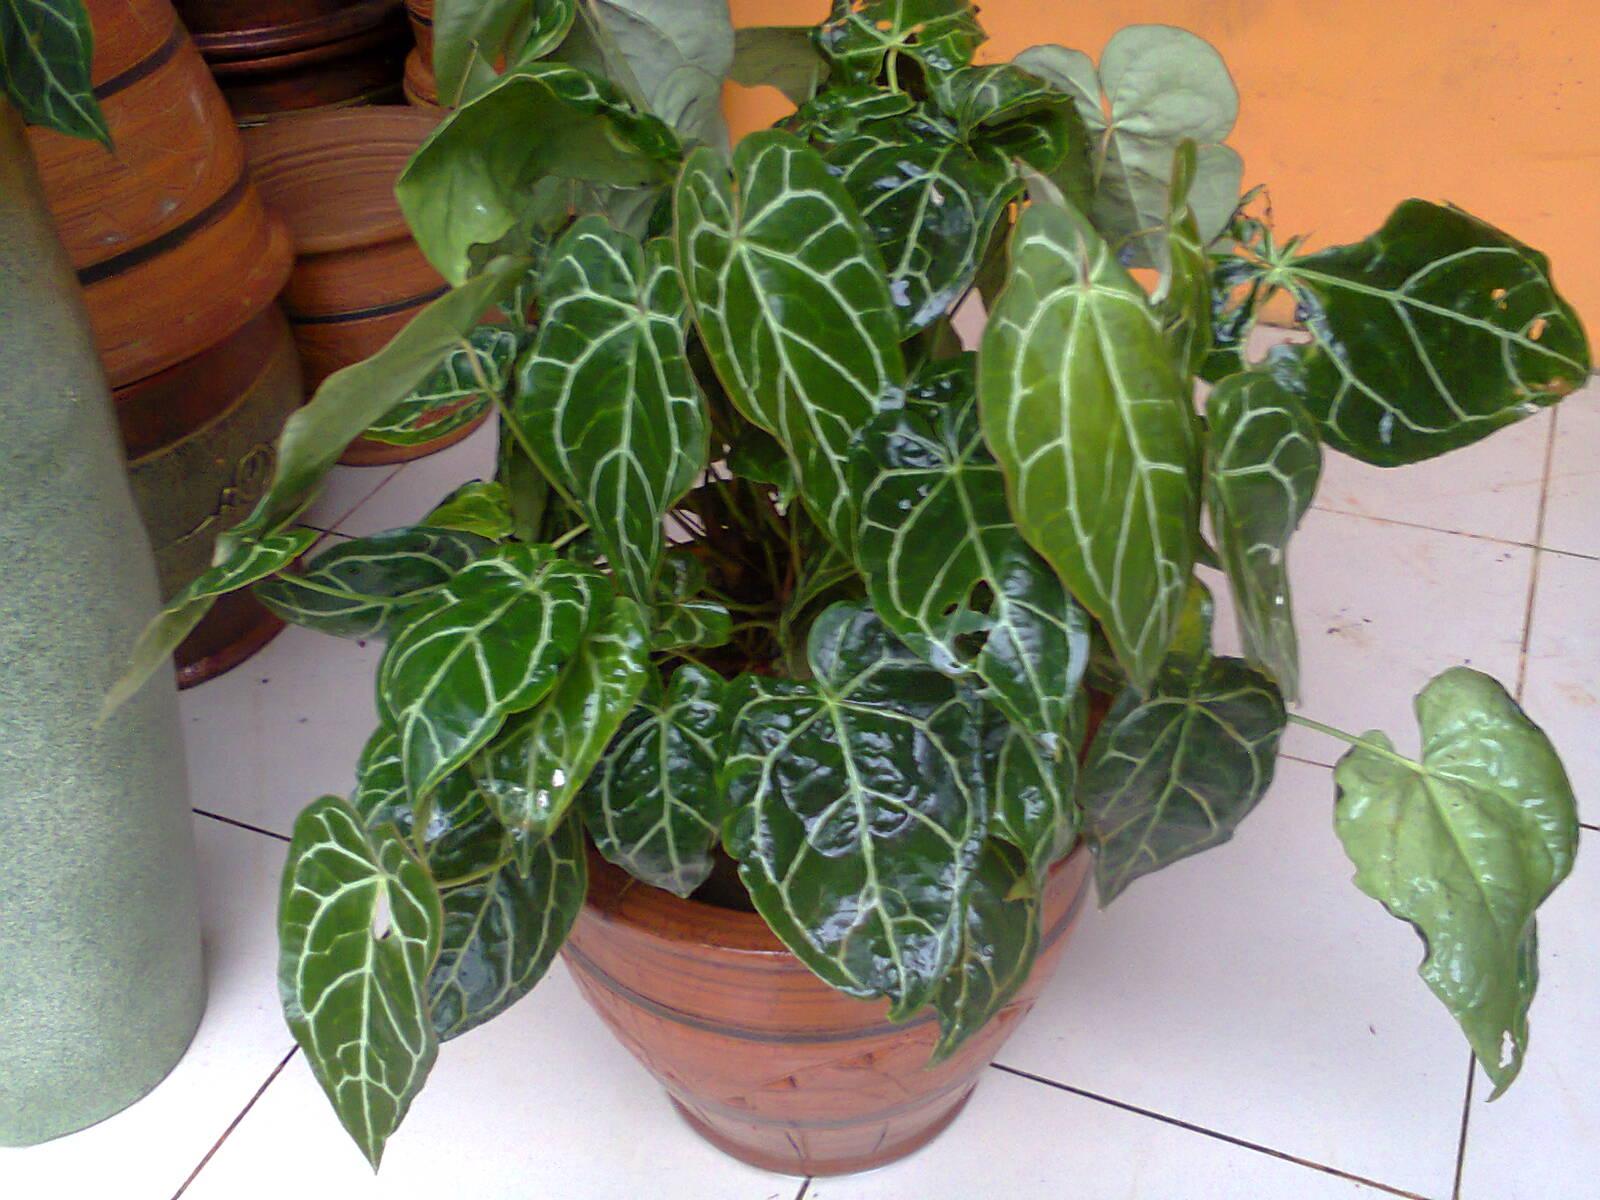 tanaman berdaun lebar anthurium kuping gajah untuk dekorasi exclusive plant